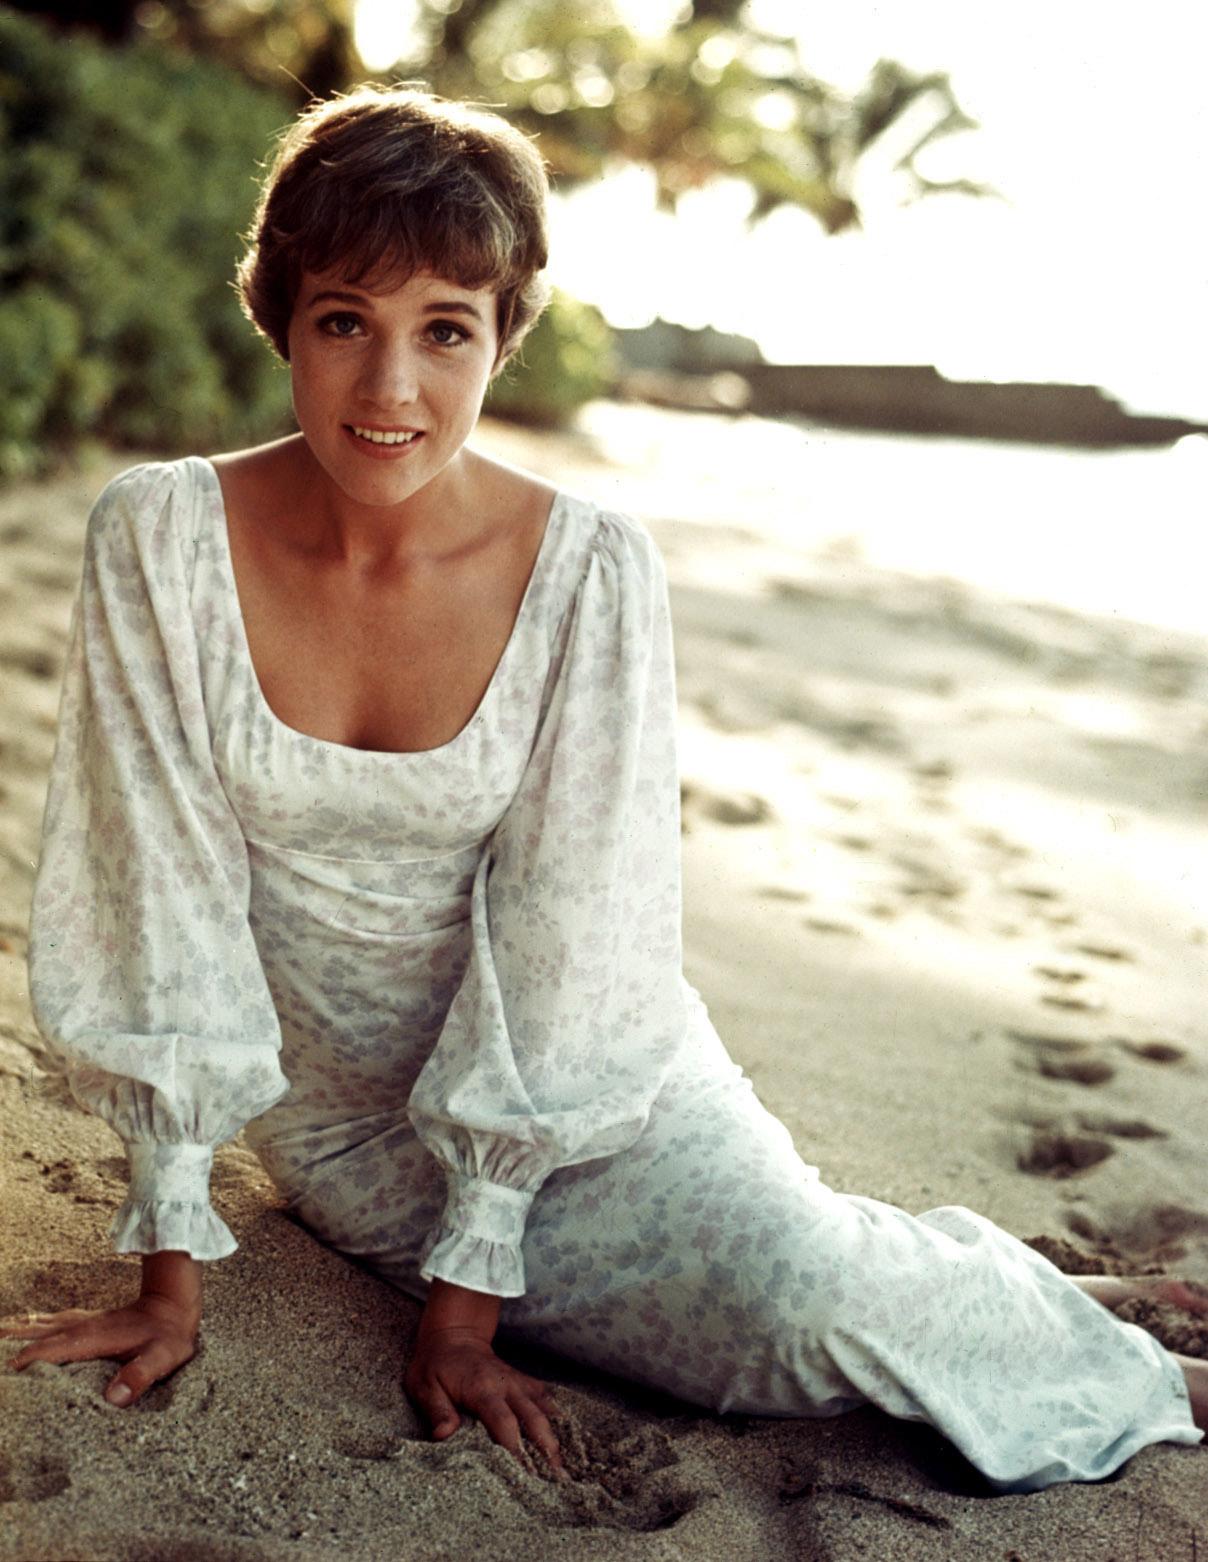 Torn curtain julie andrews - Torn Curtain Julie Andrews 30